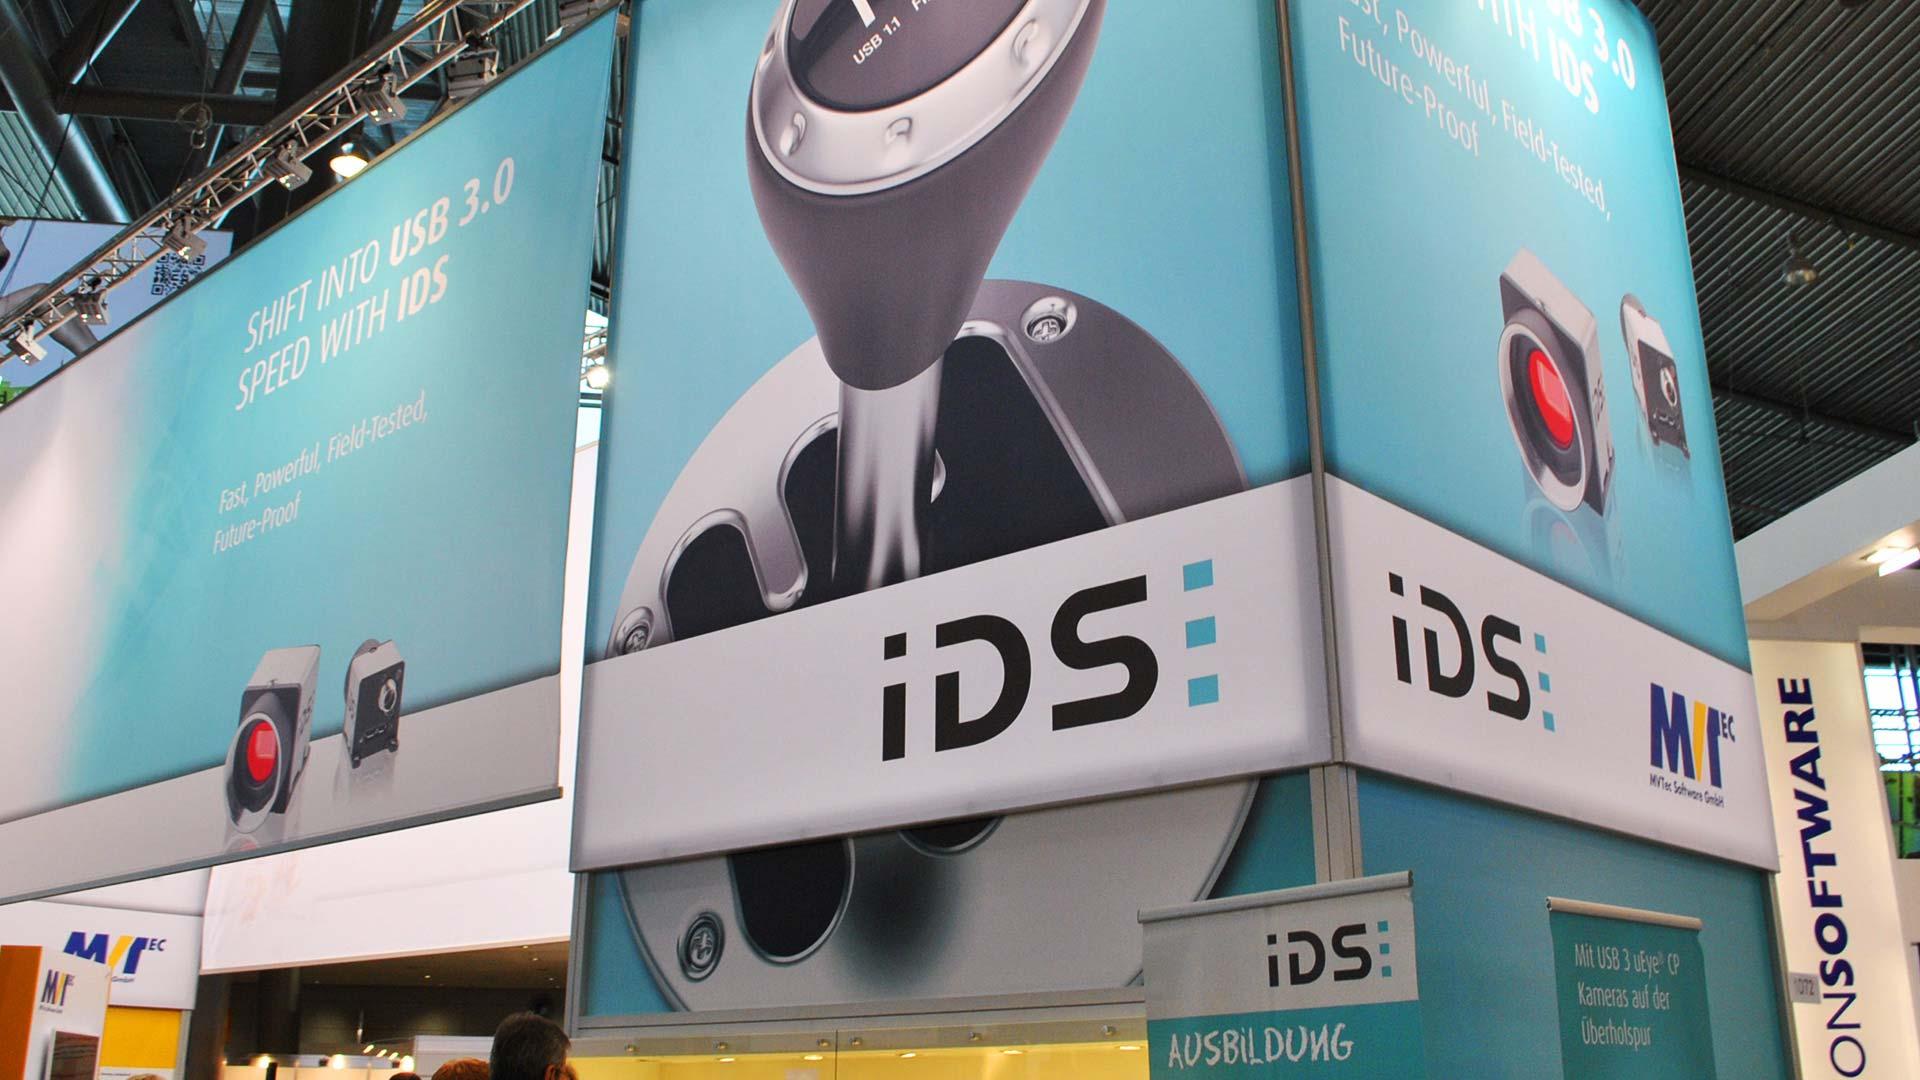 ids vision 2012